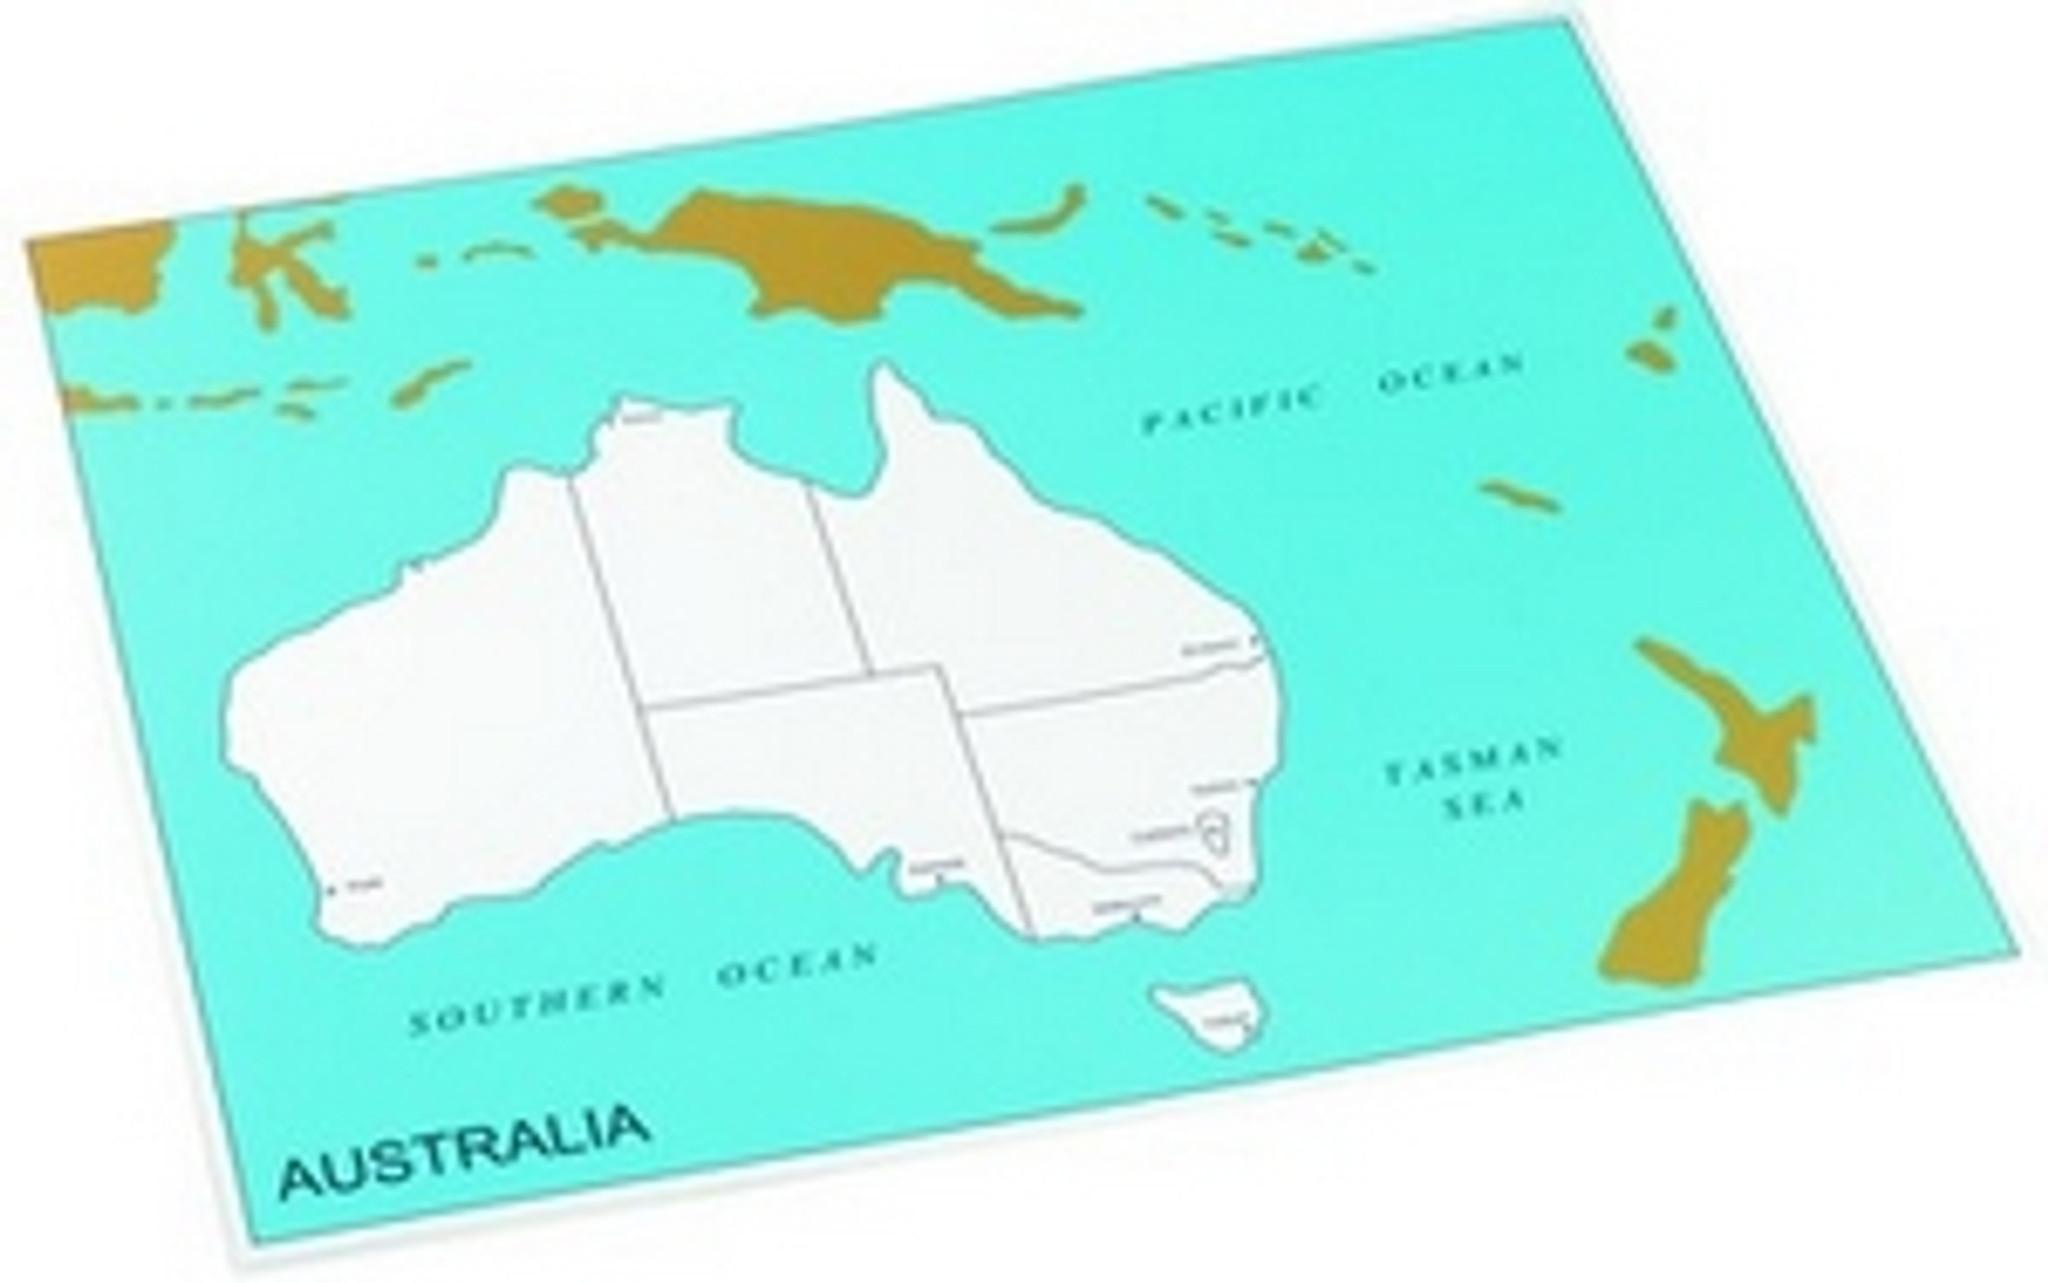 Control chart of Australia, states , capitals